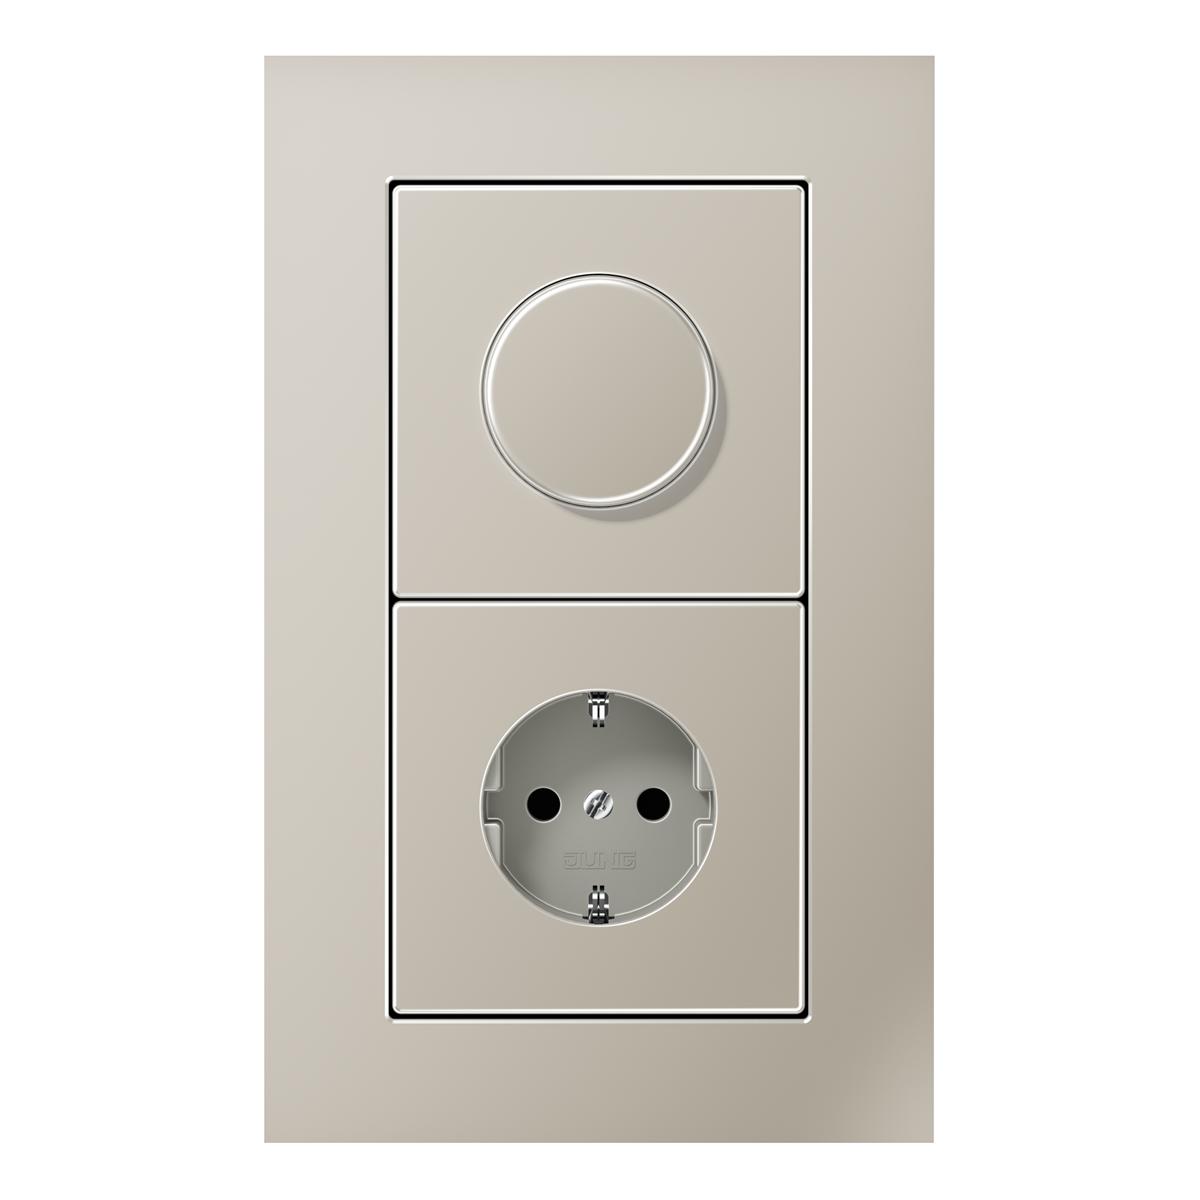 LS plus dimmer-socket stainless-steel - на 360.ru: цены, описание, характеристики, где купить в Москве.